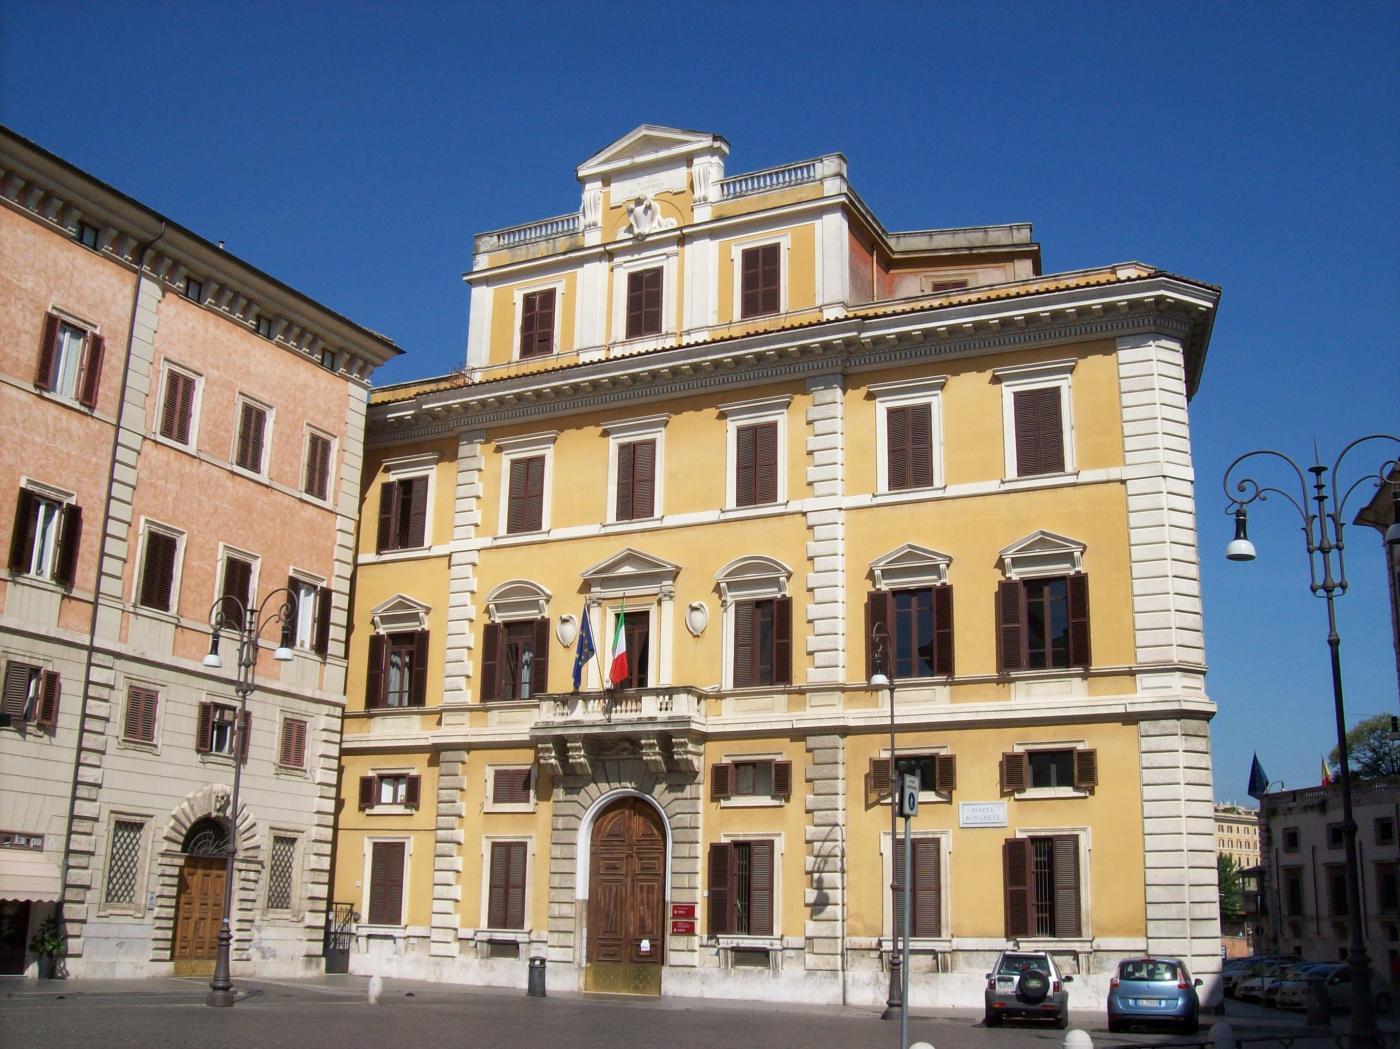 University of Rome La Sapienza